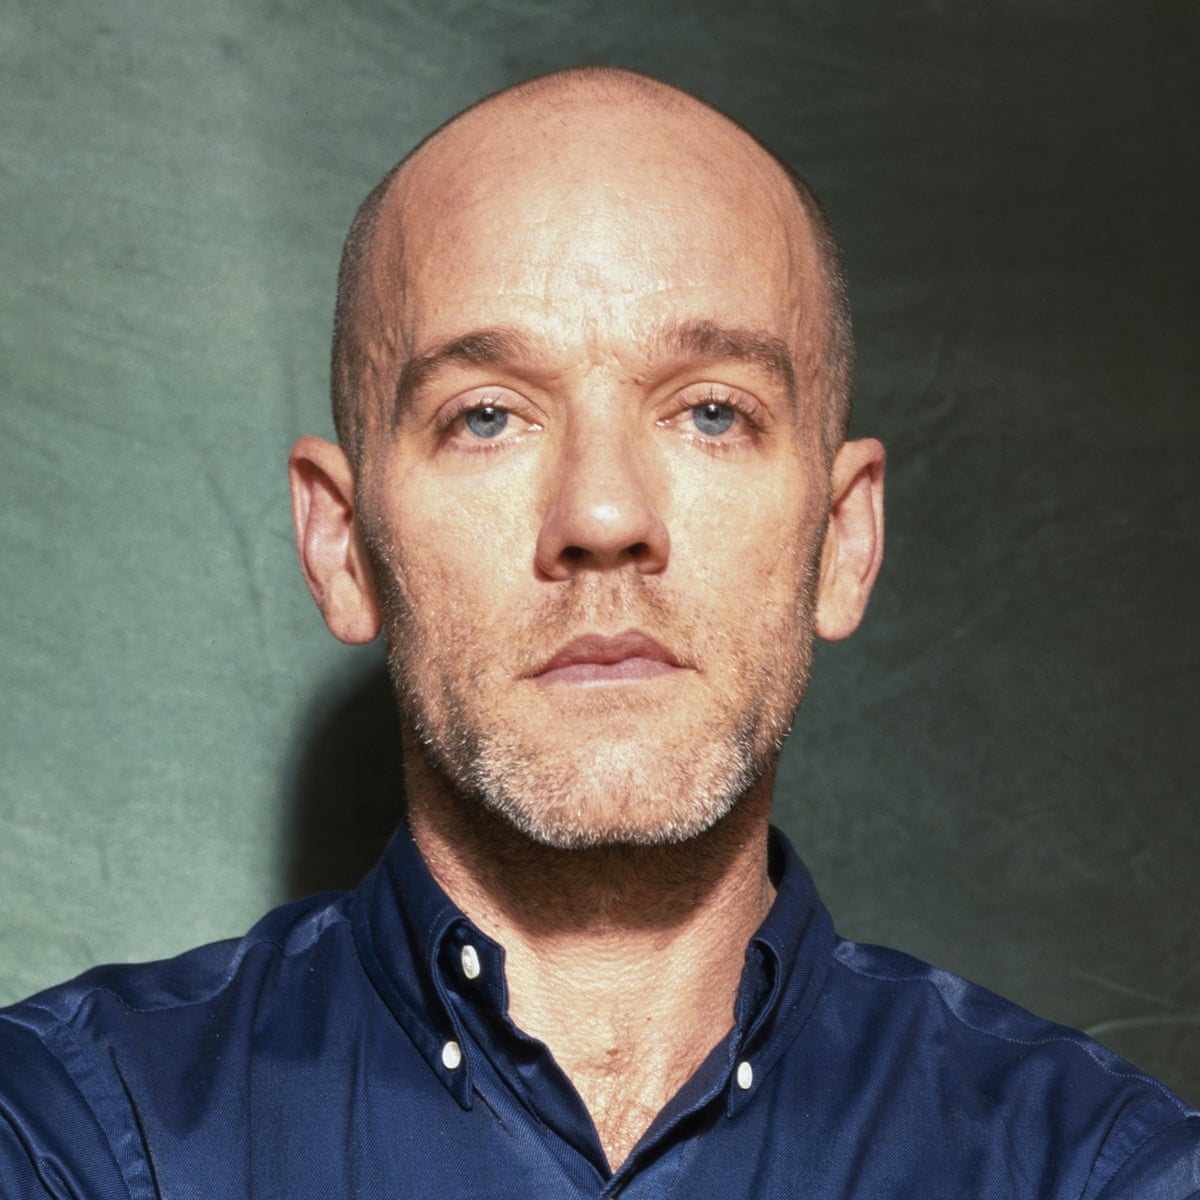 I'm a pretty good pop star': Michael Stipe on his favourite REM ...